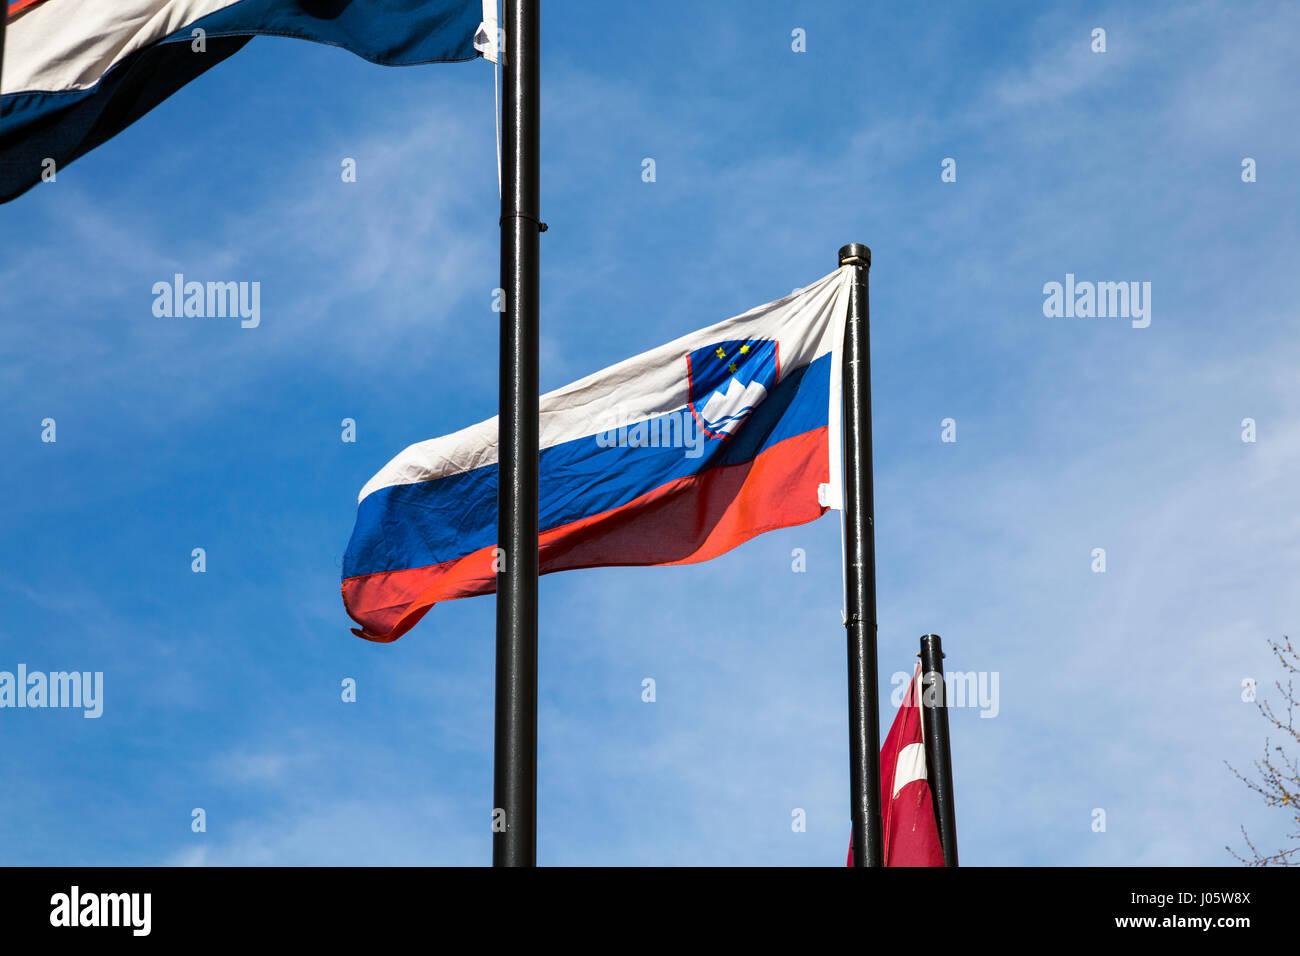 Slovenian flag on a flagpole outside - Stock Image